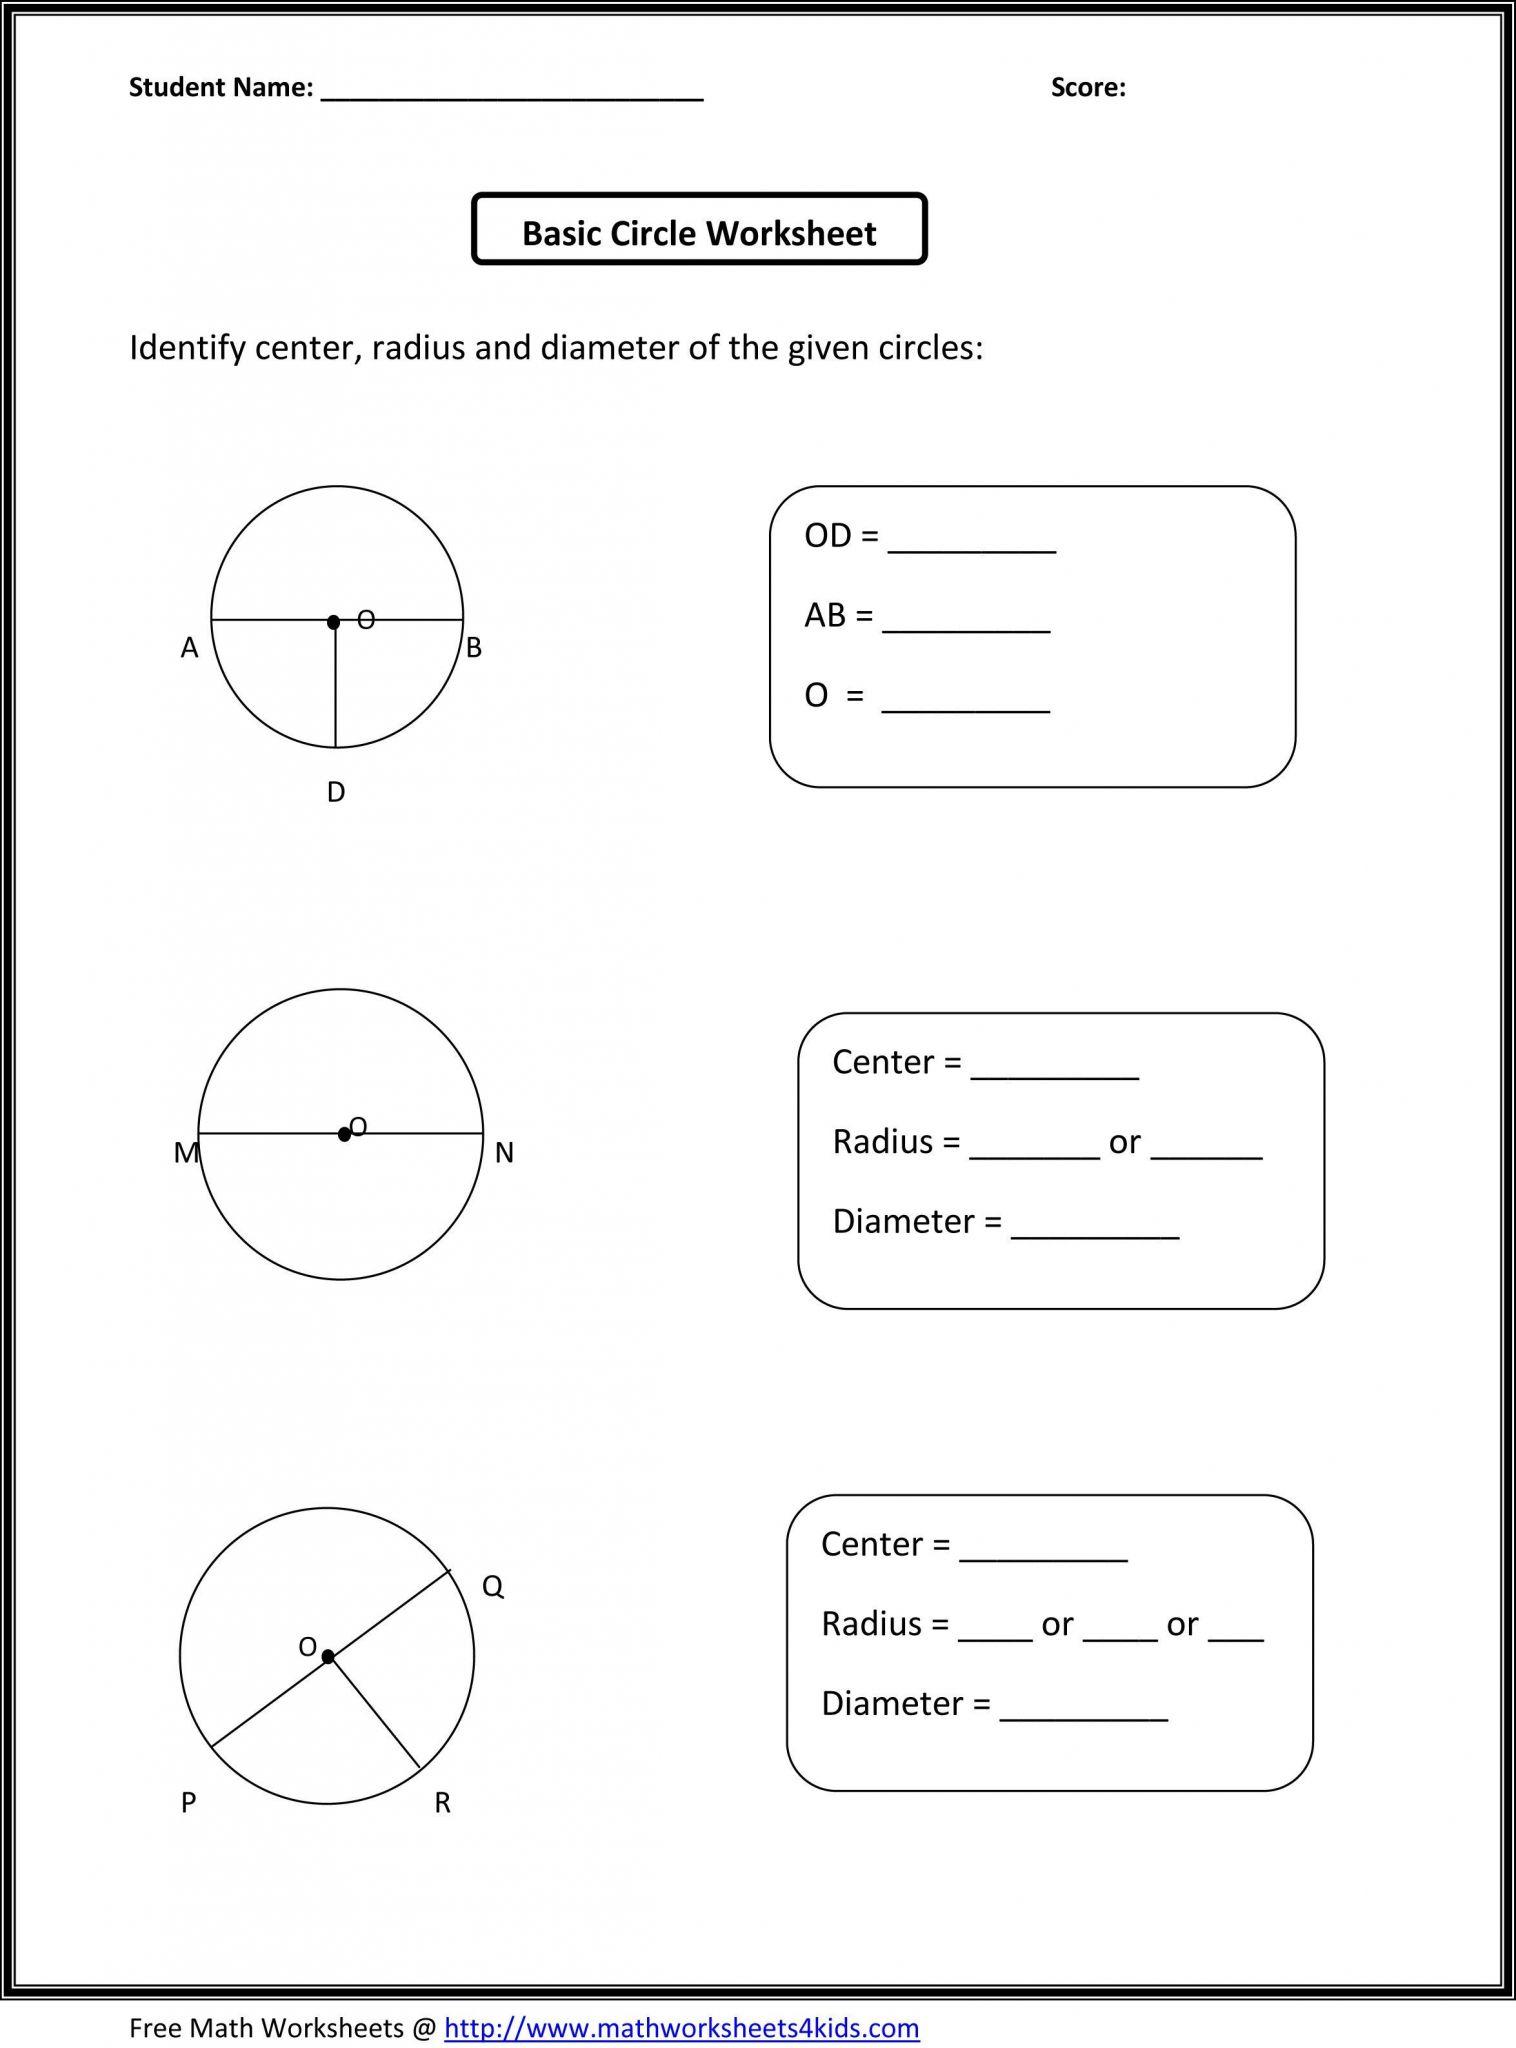 Yzing Graphs Worksheet